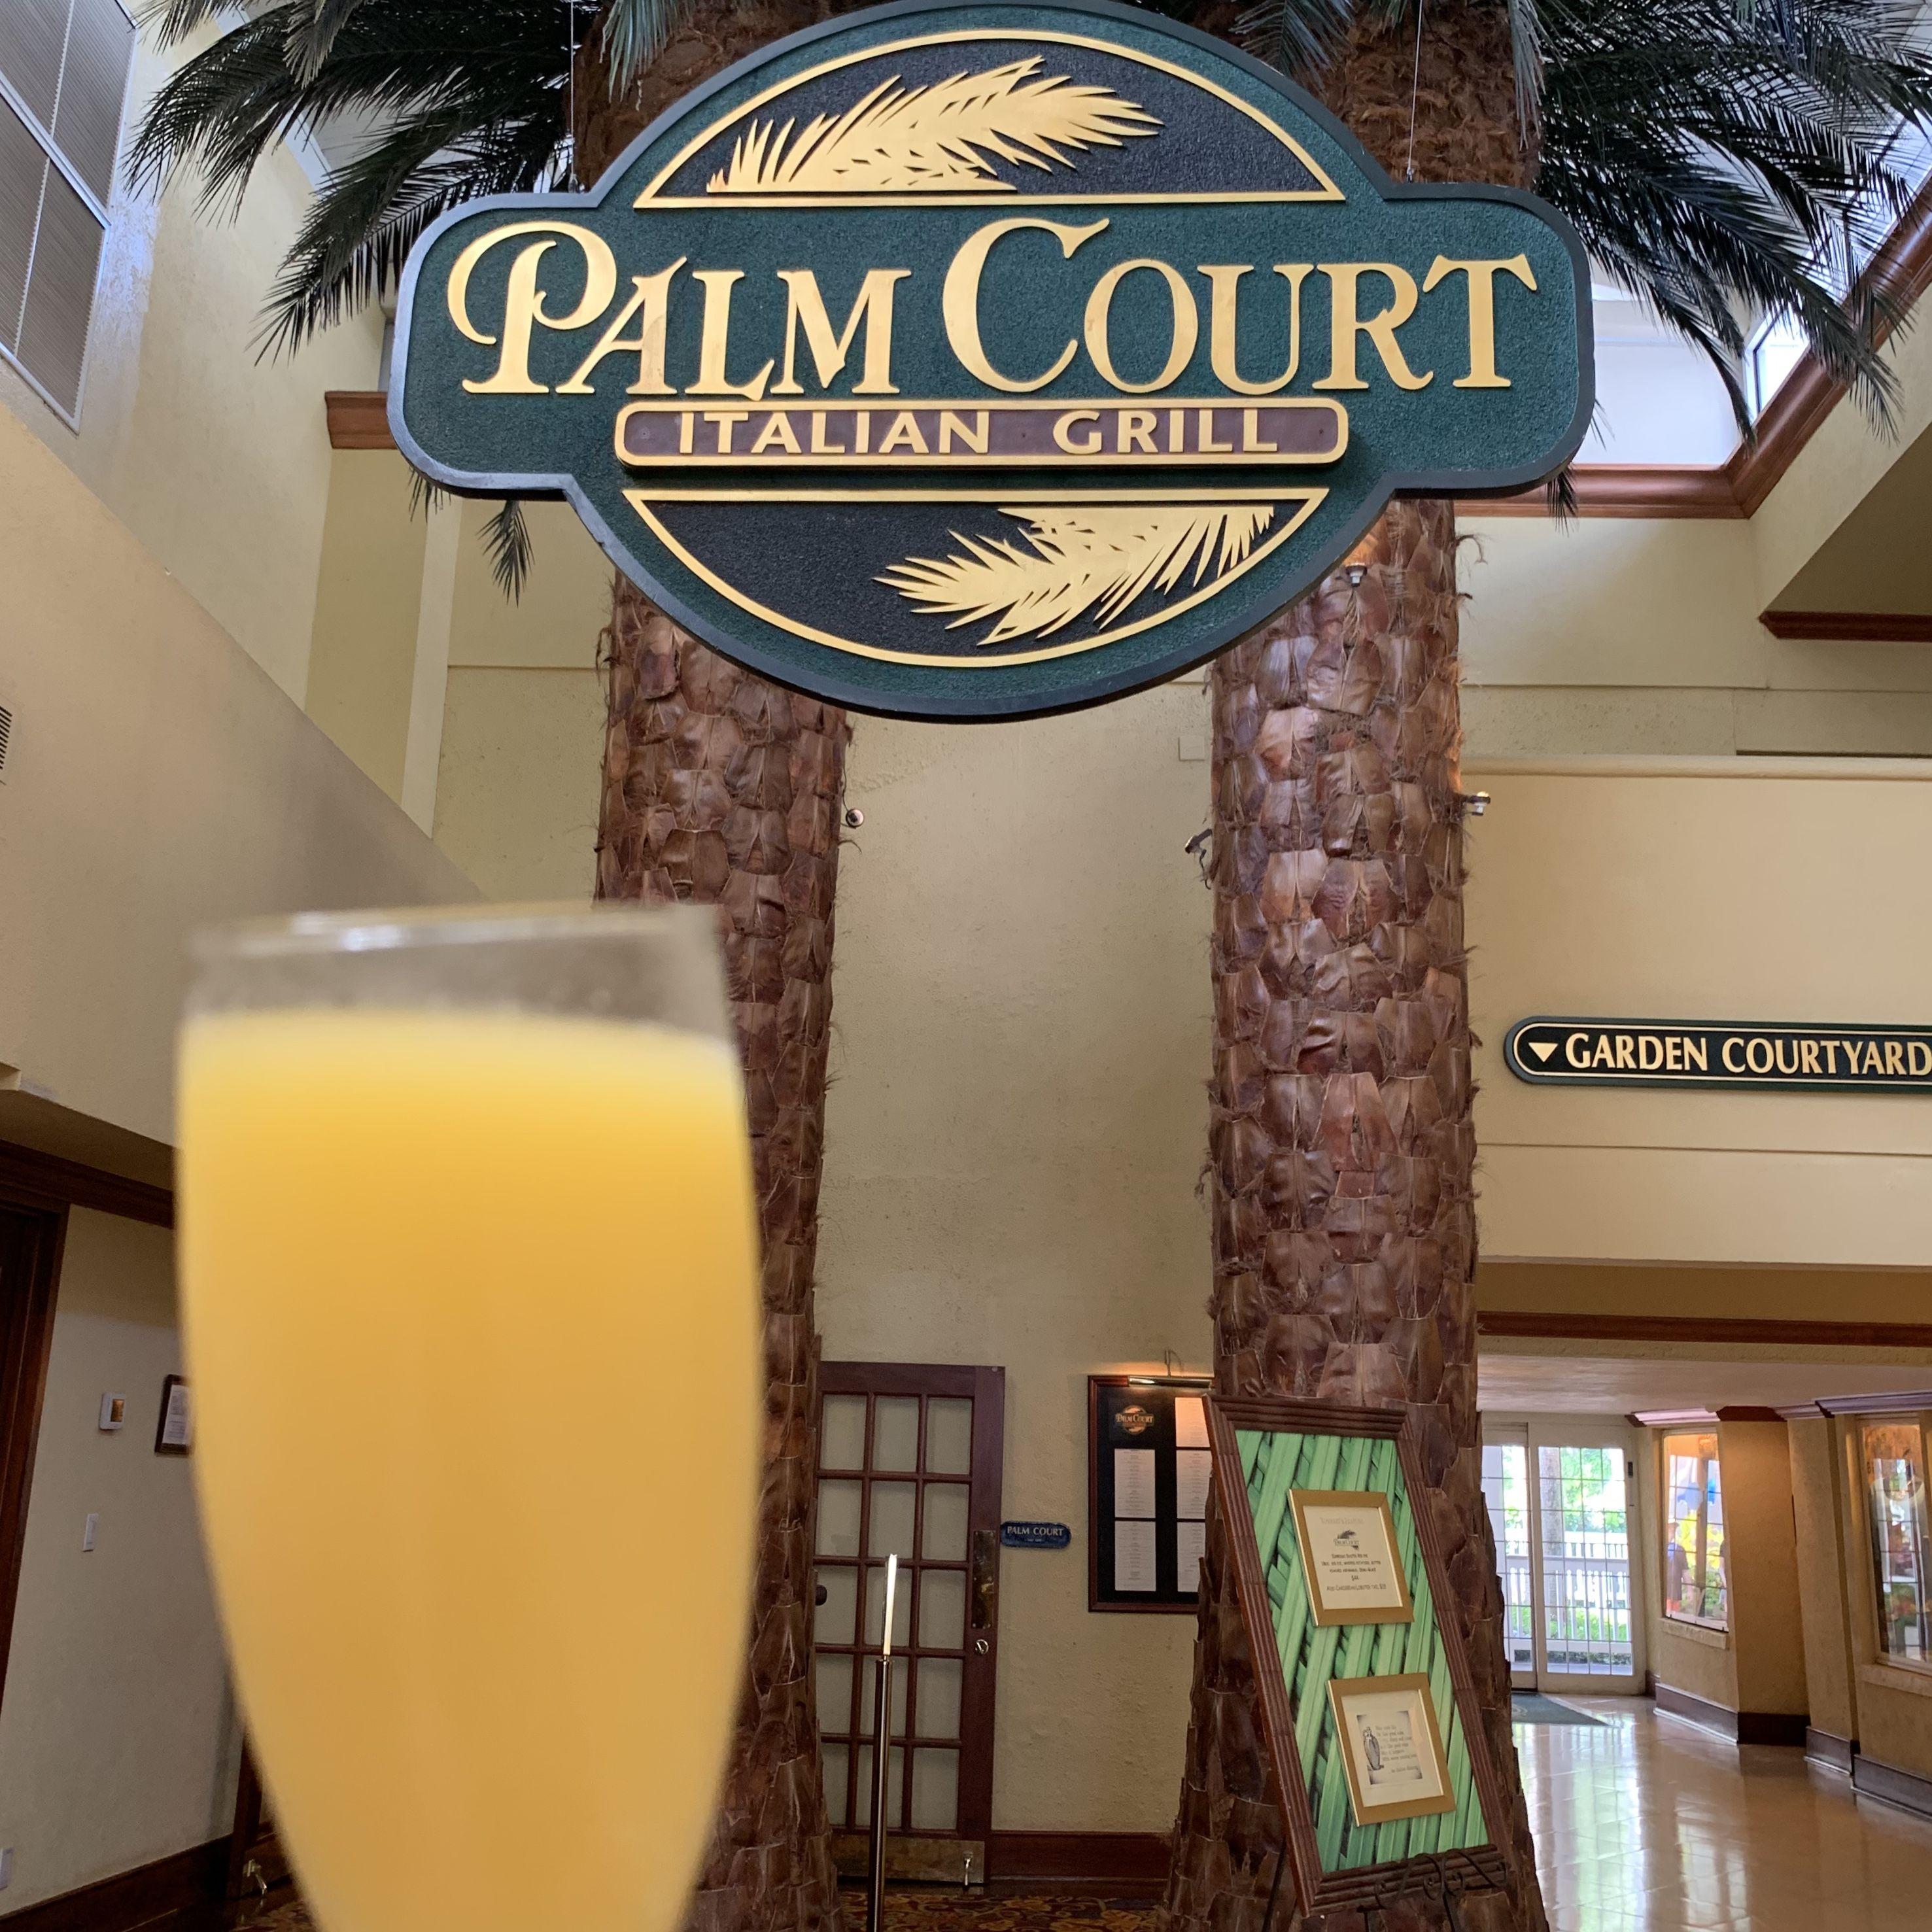 Do you love brunch? Palm Court hosts a great brunch on